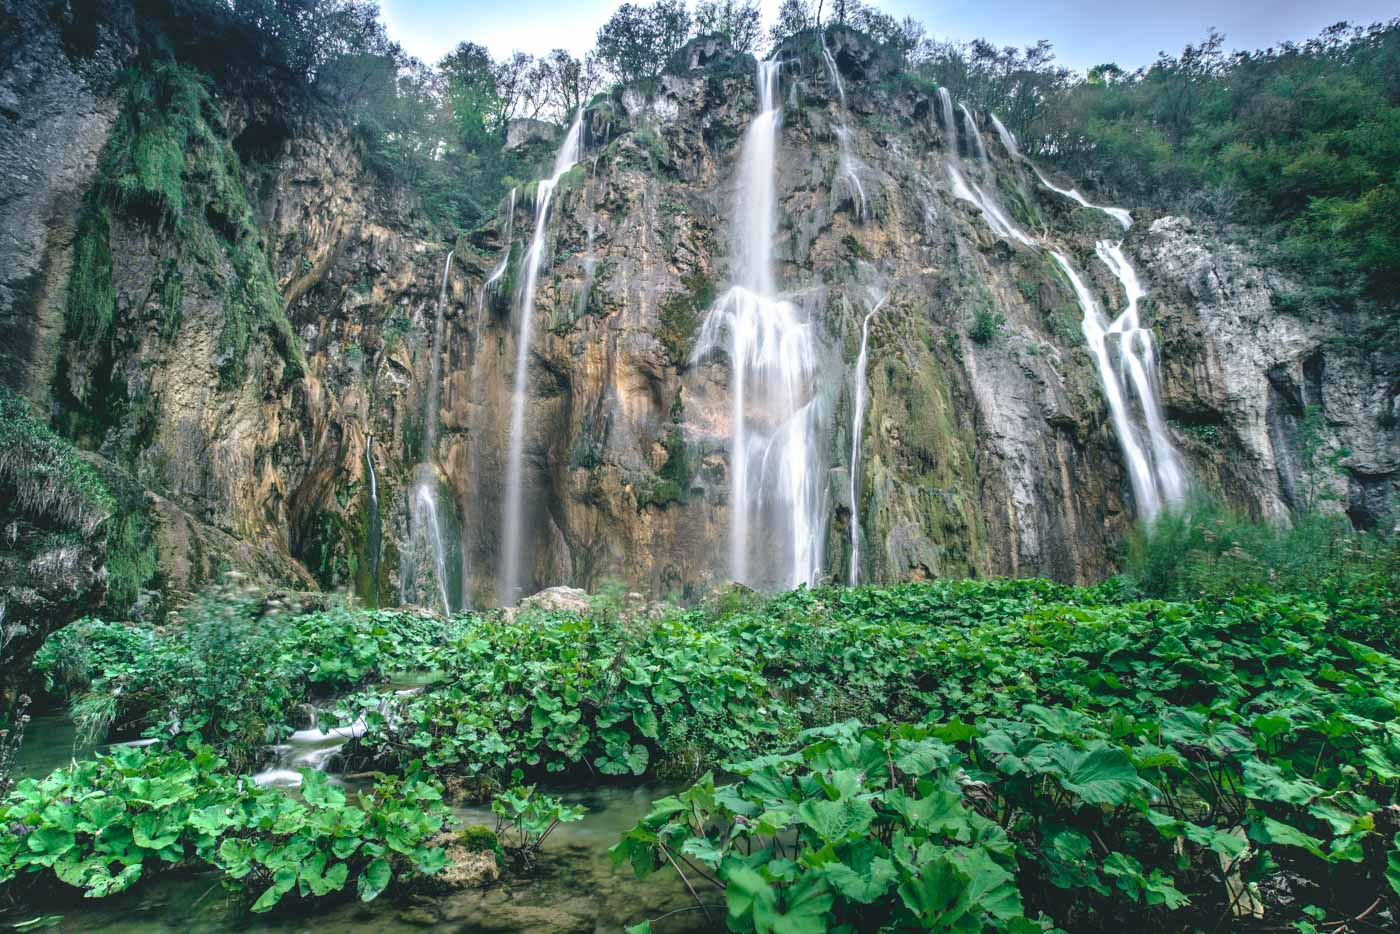 Big waterfall, Plitvice Lakes National Park, Central Croatia